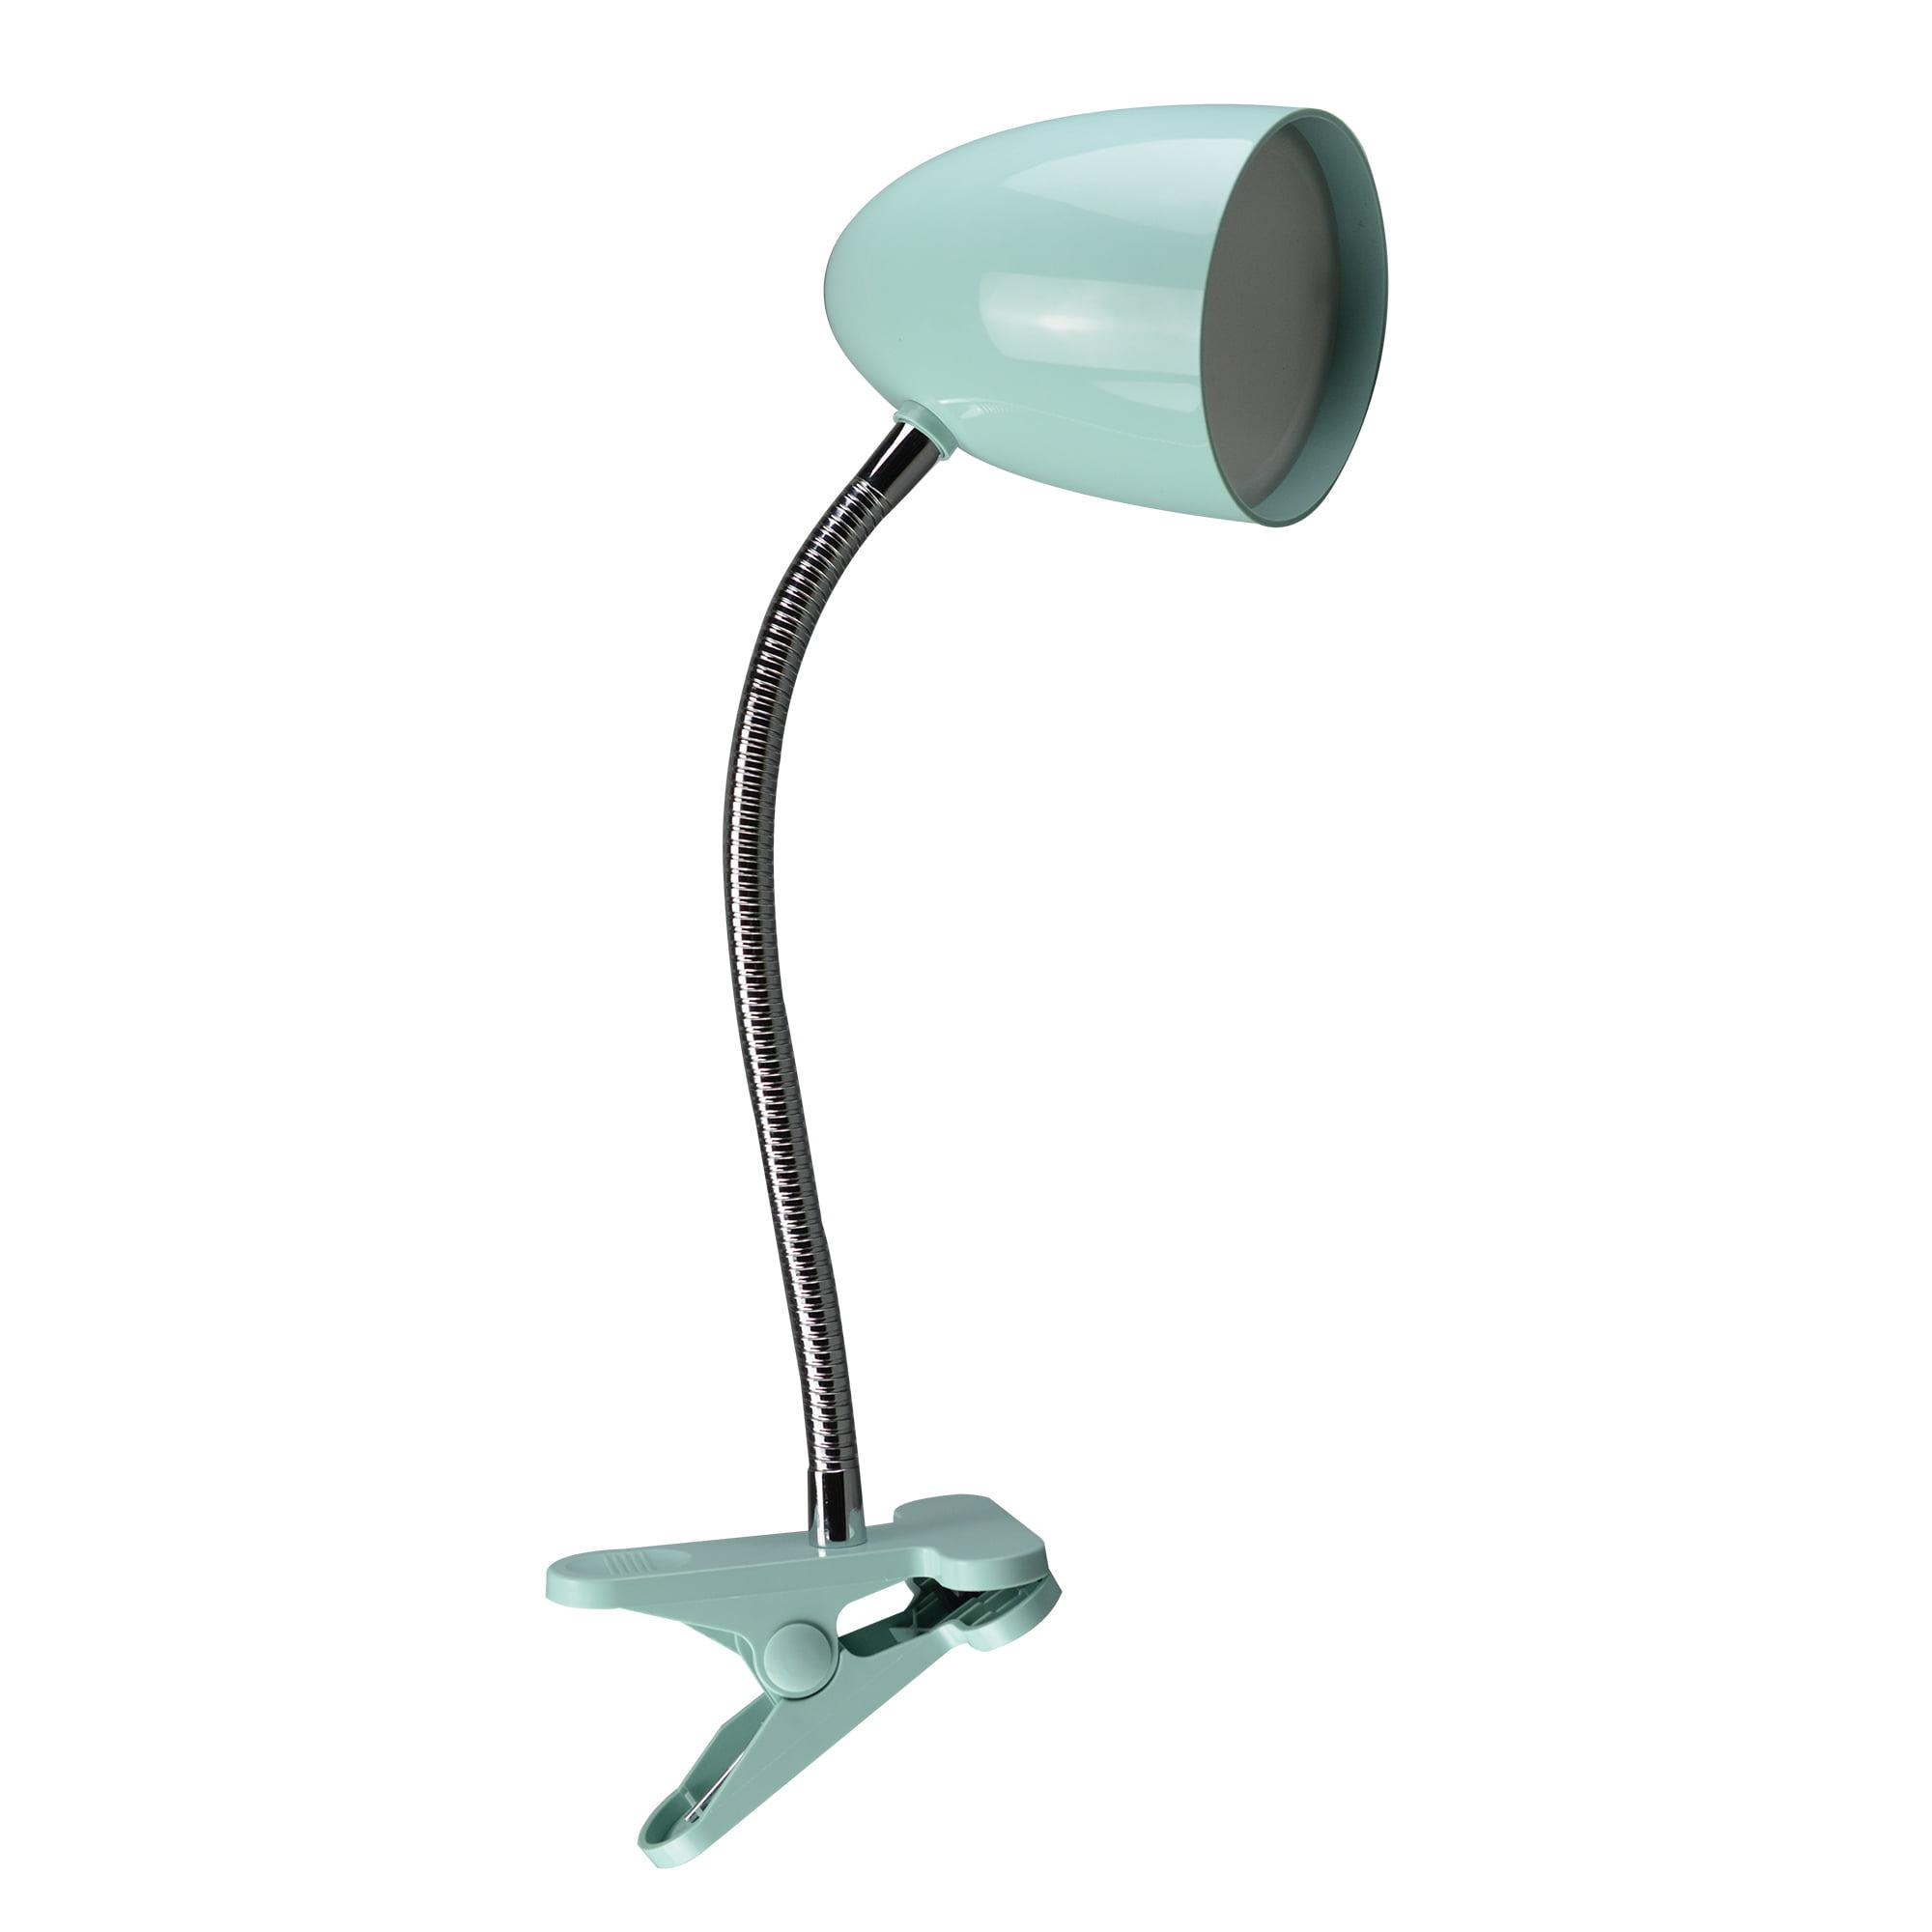 Mainstays LED Clip-on Lamp by ZHEJIANG YANKON GROUP CO., LTD